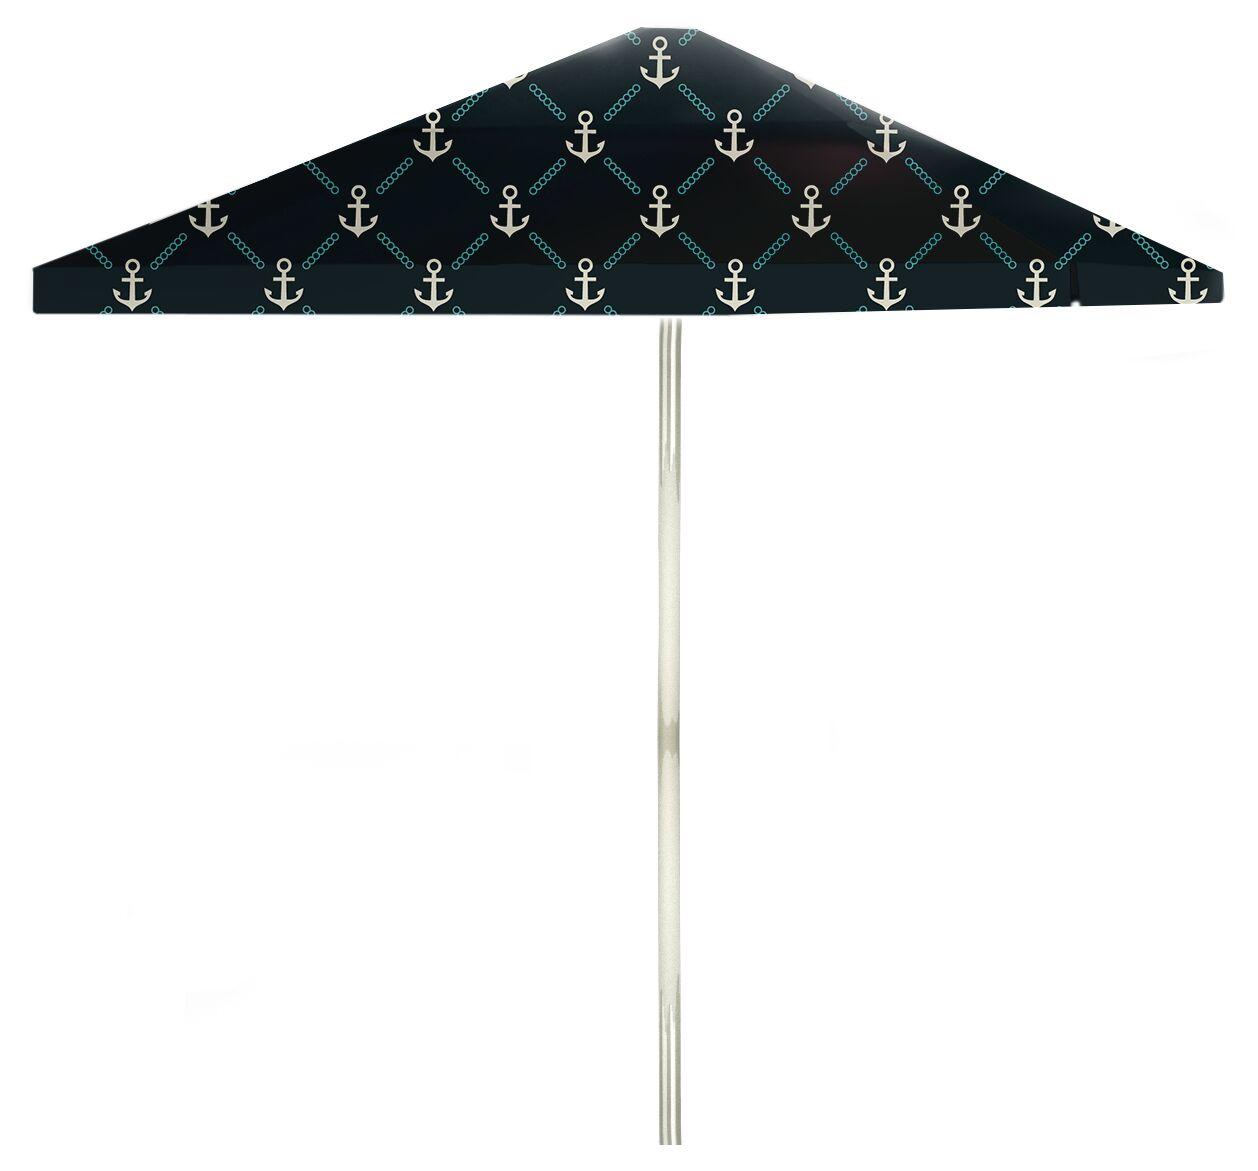 6' Square Market Umbrella Color: Gray/Teal/Navy